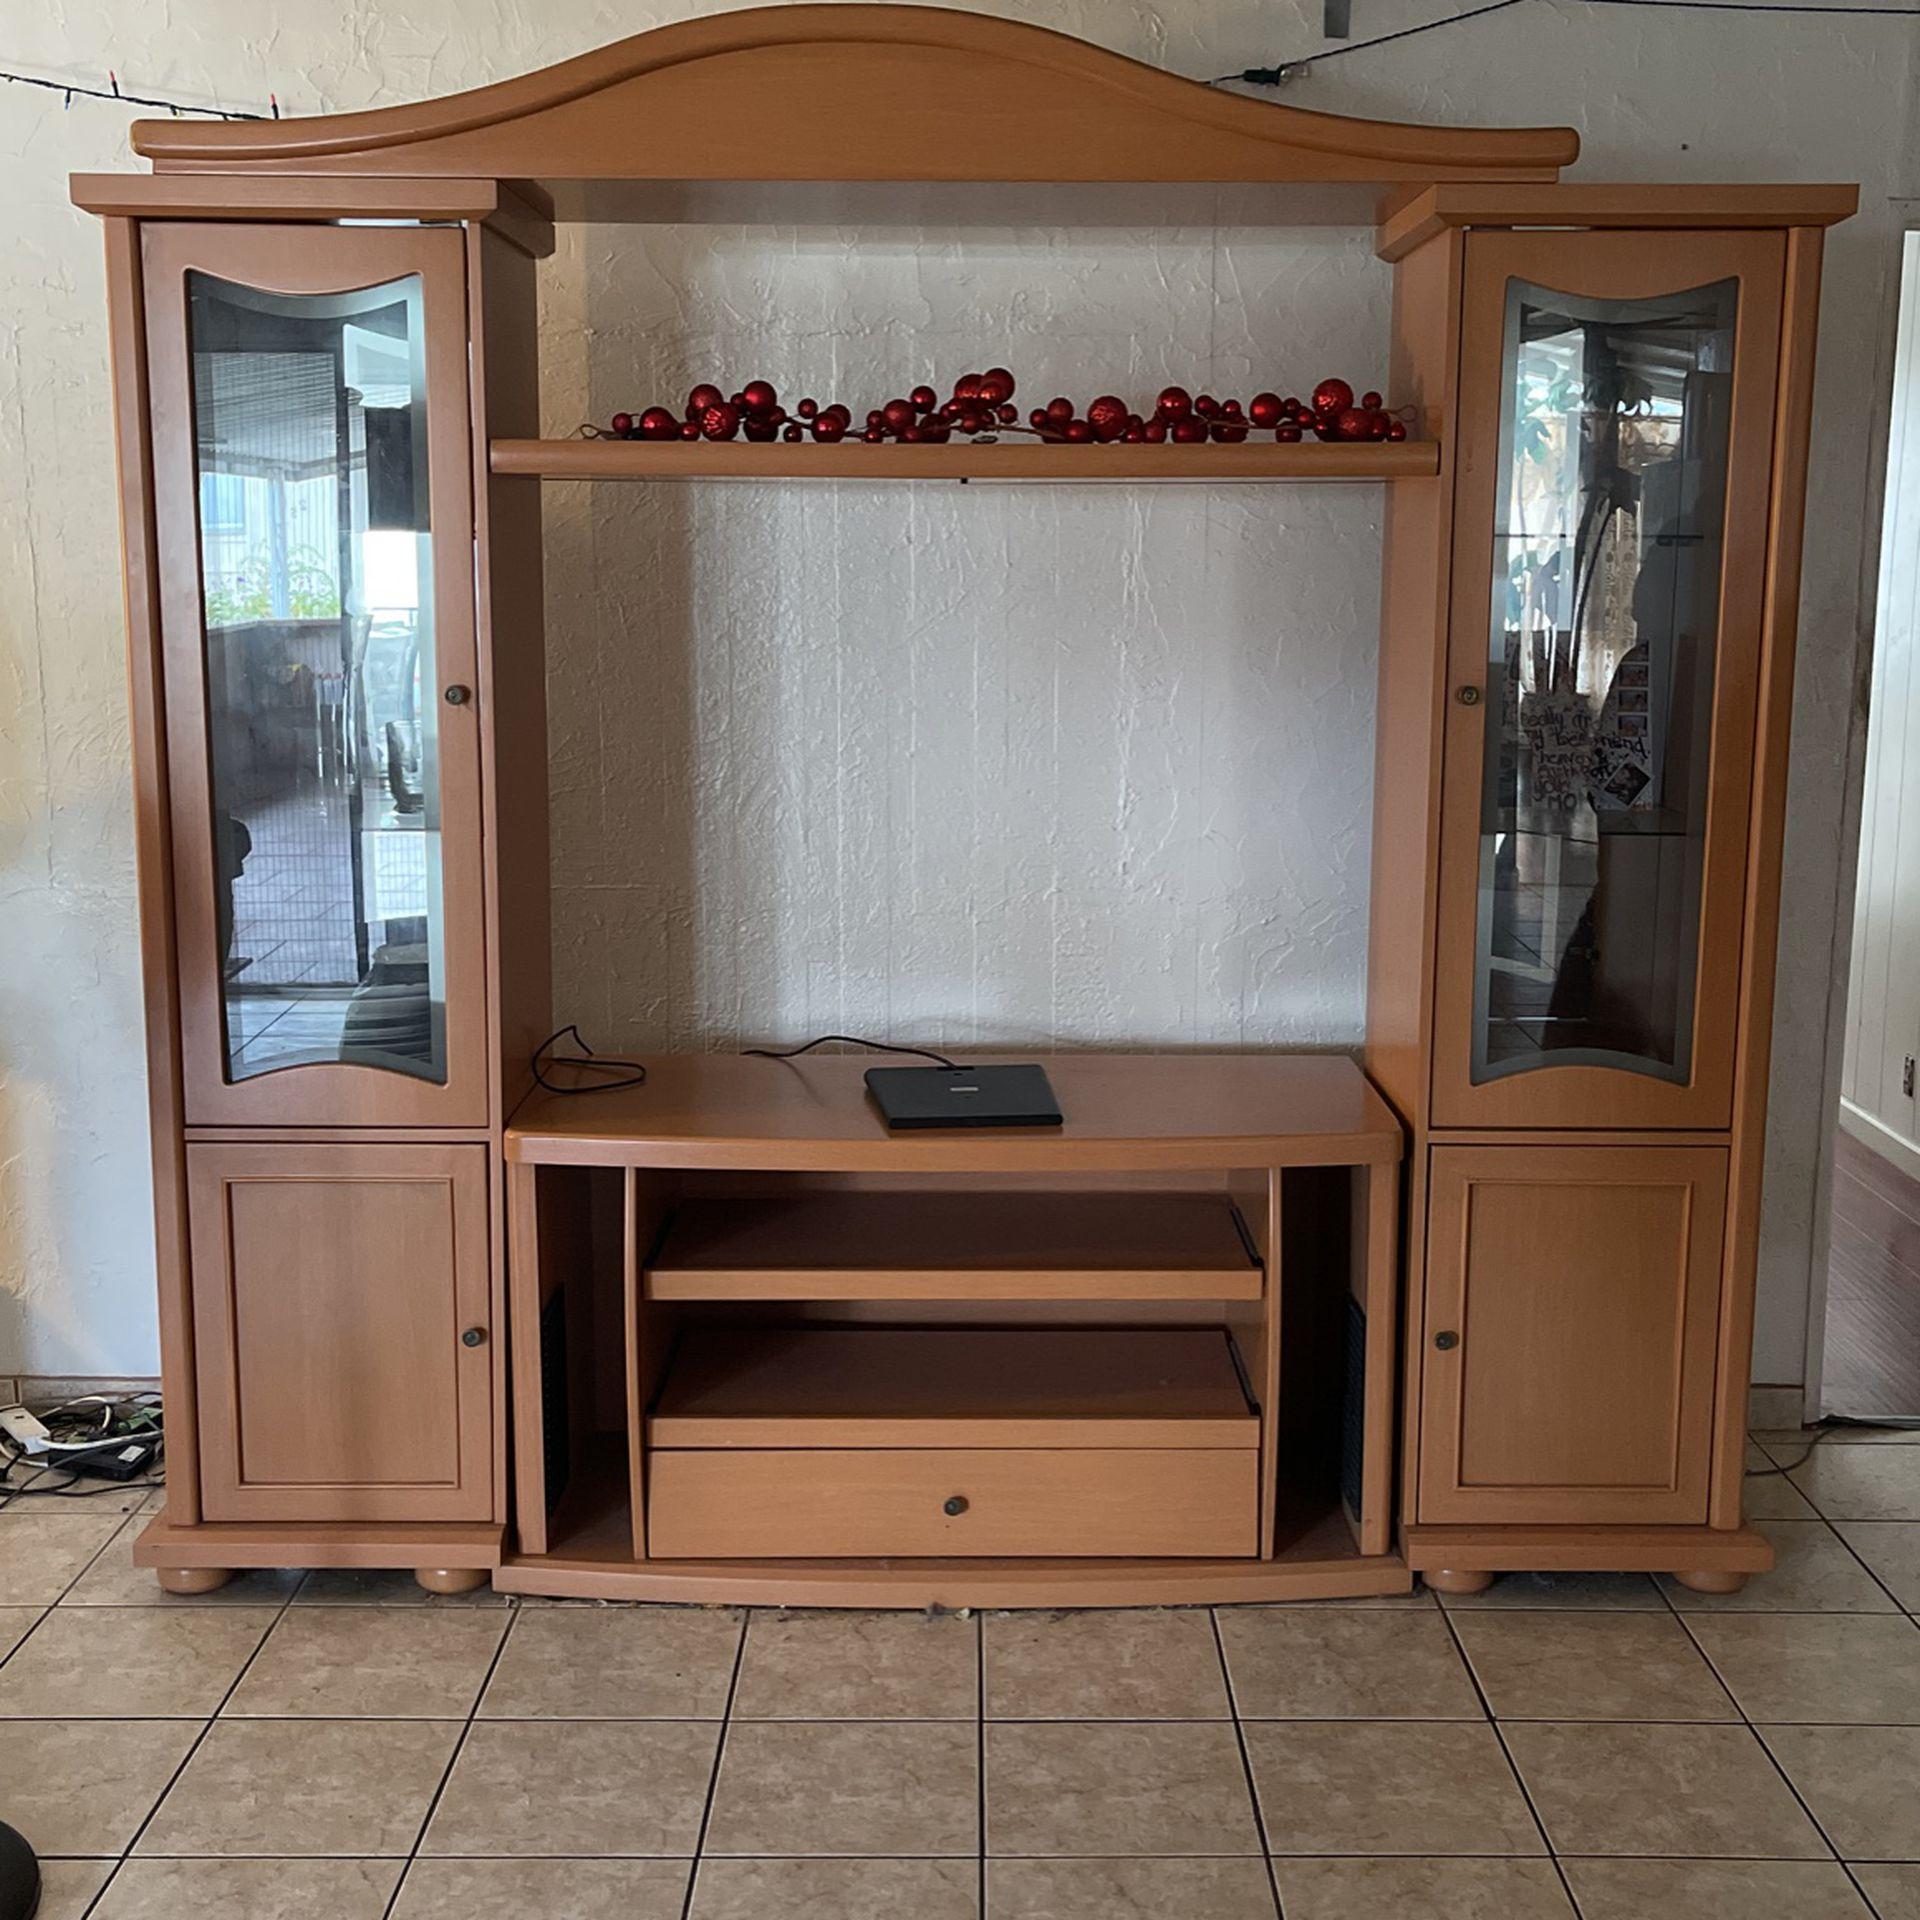 Polished Wood- TV Stand